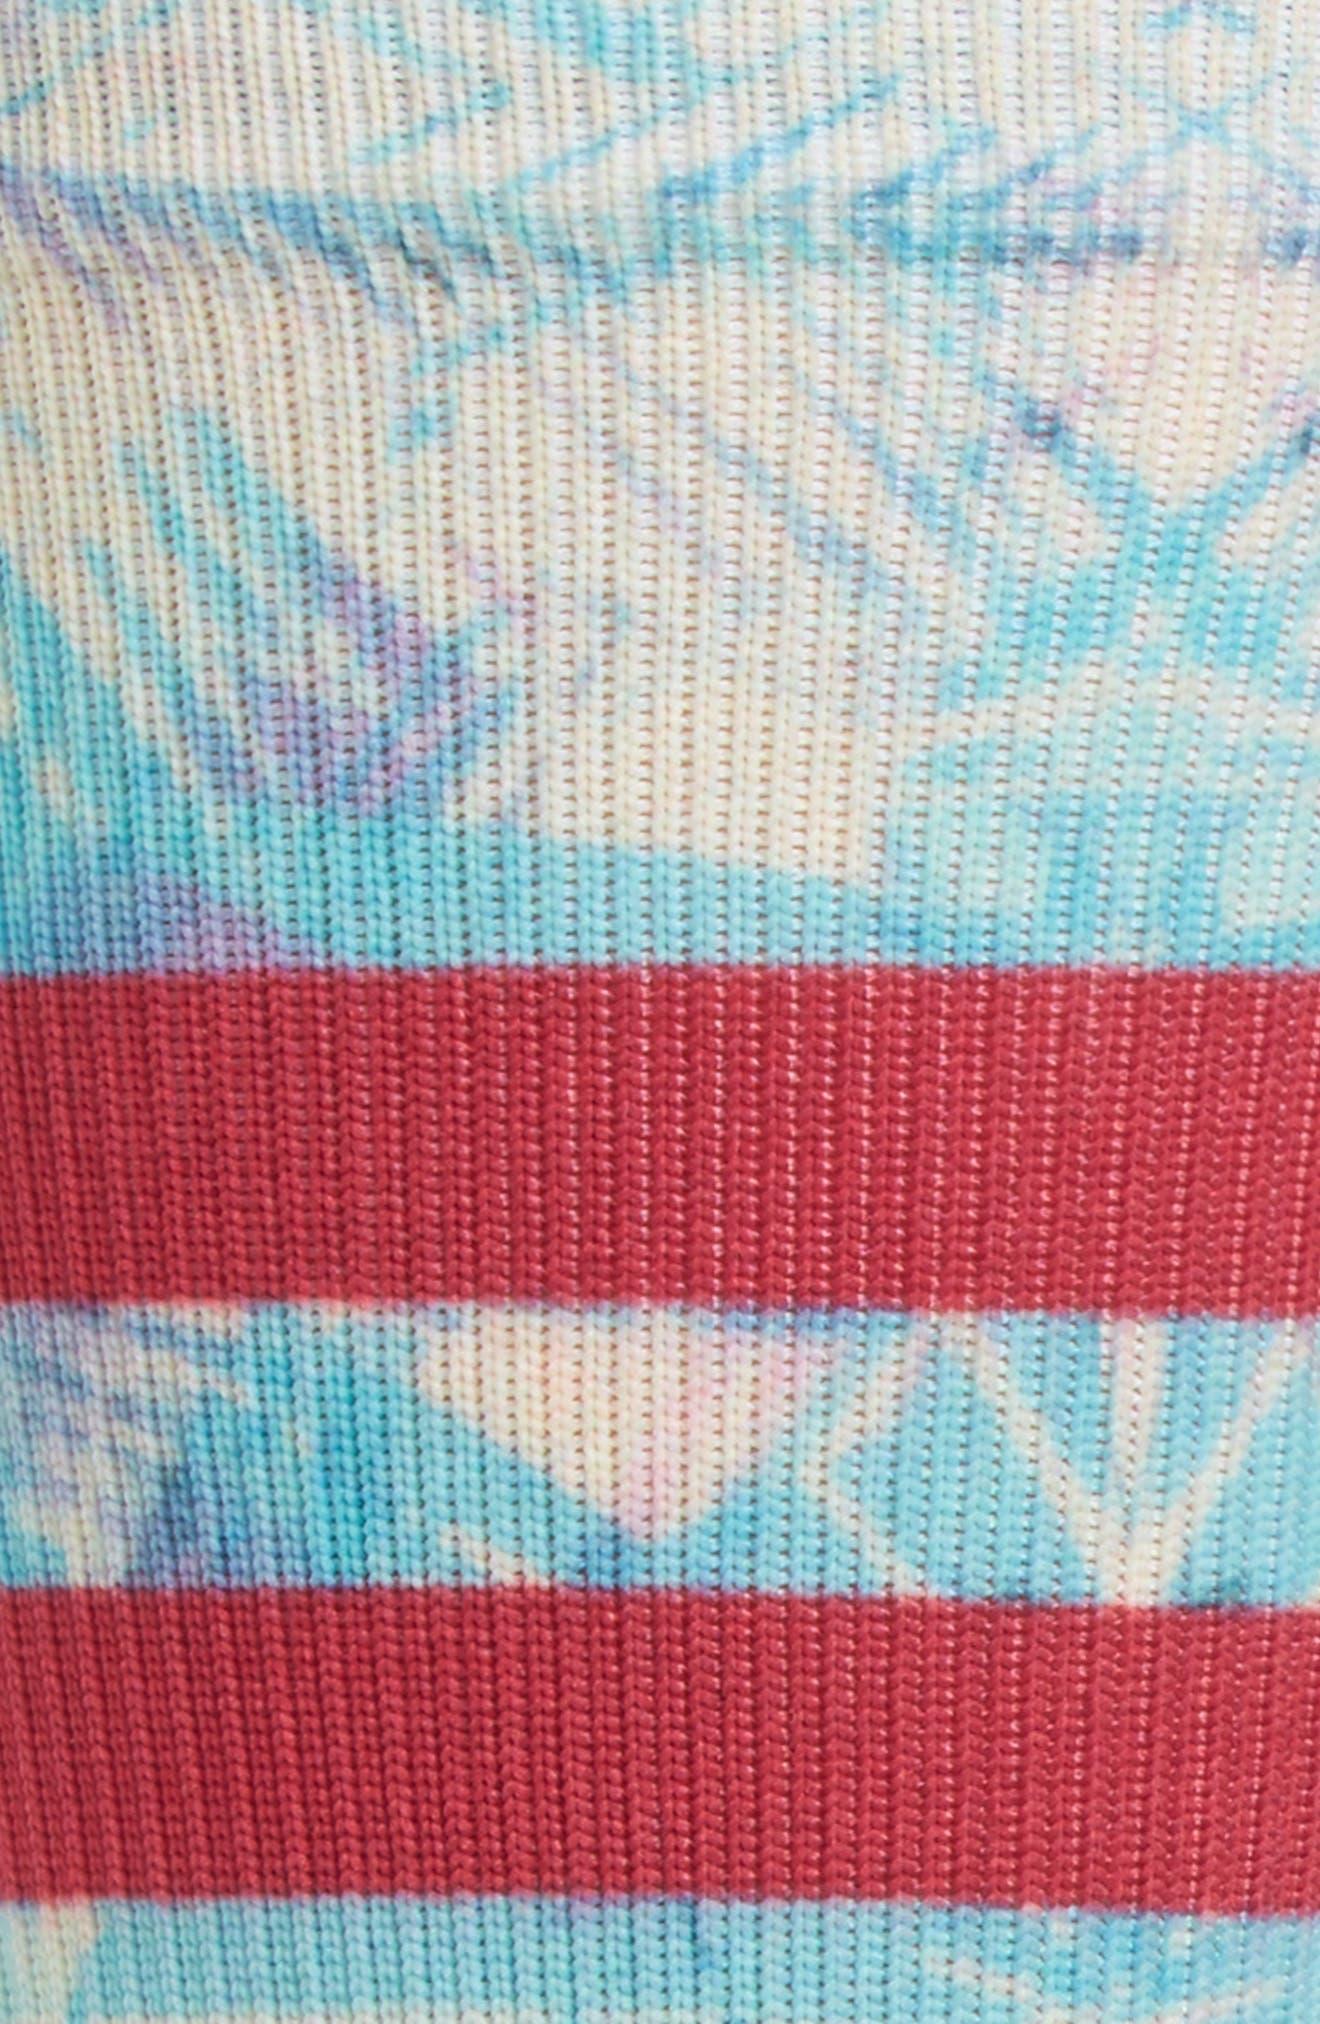 Ultraviolet Atheltic Crew Socks,                             Alternate thumbnail 2, color,                             420